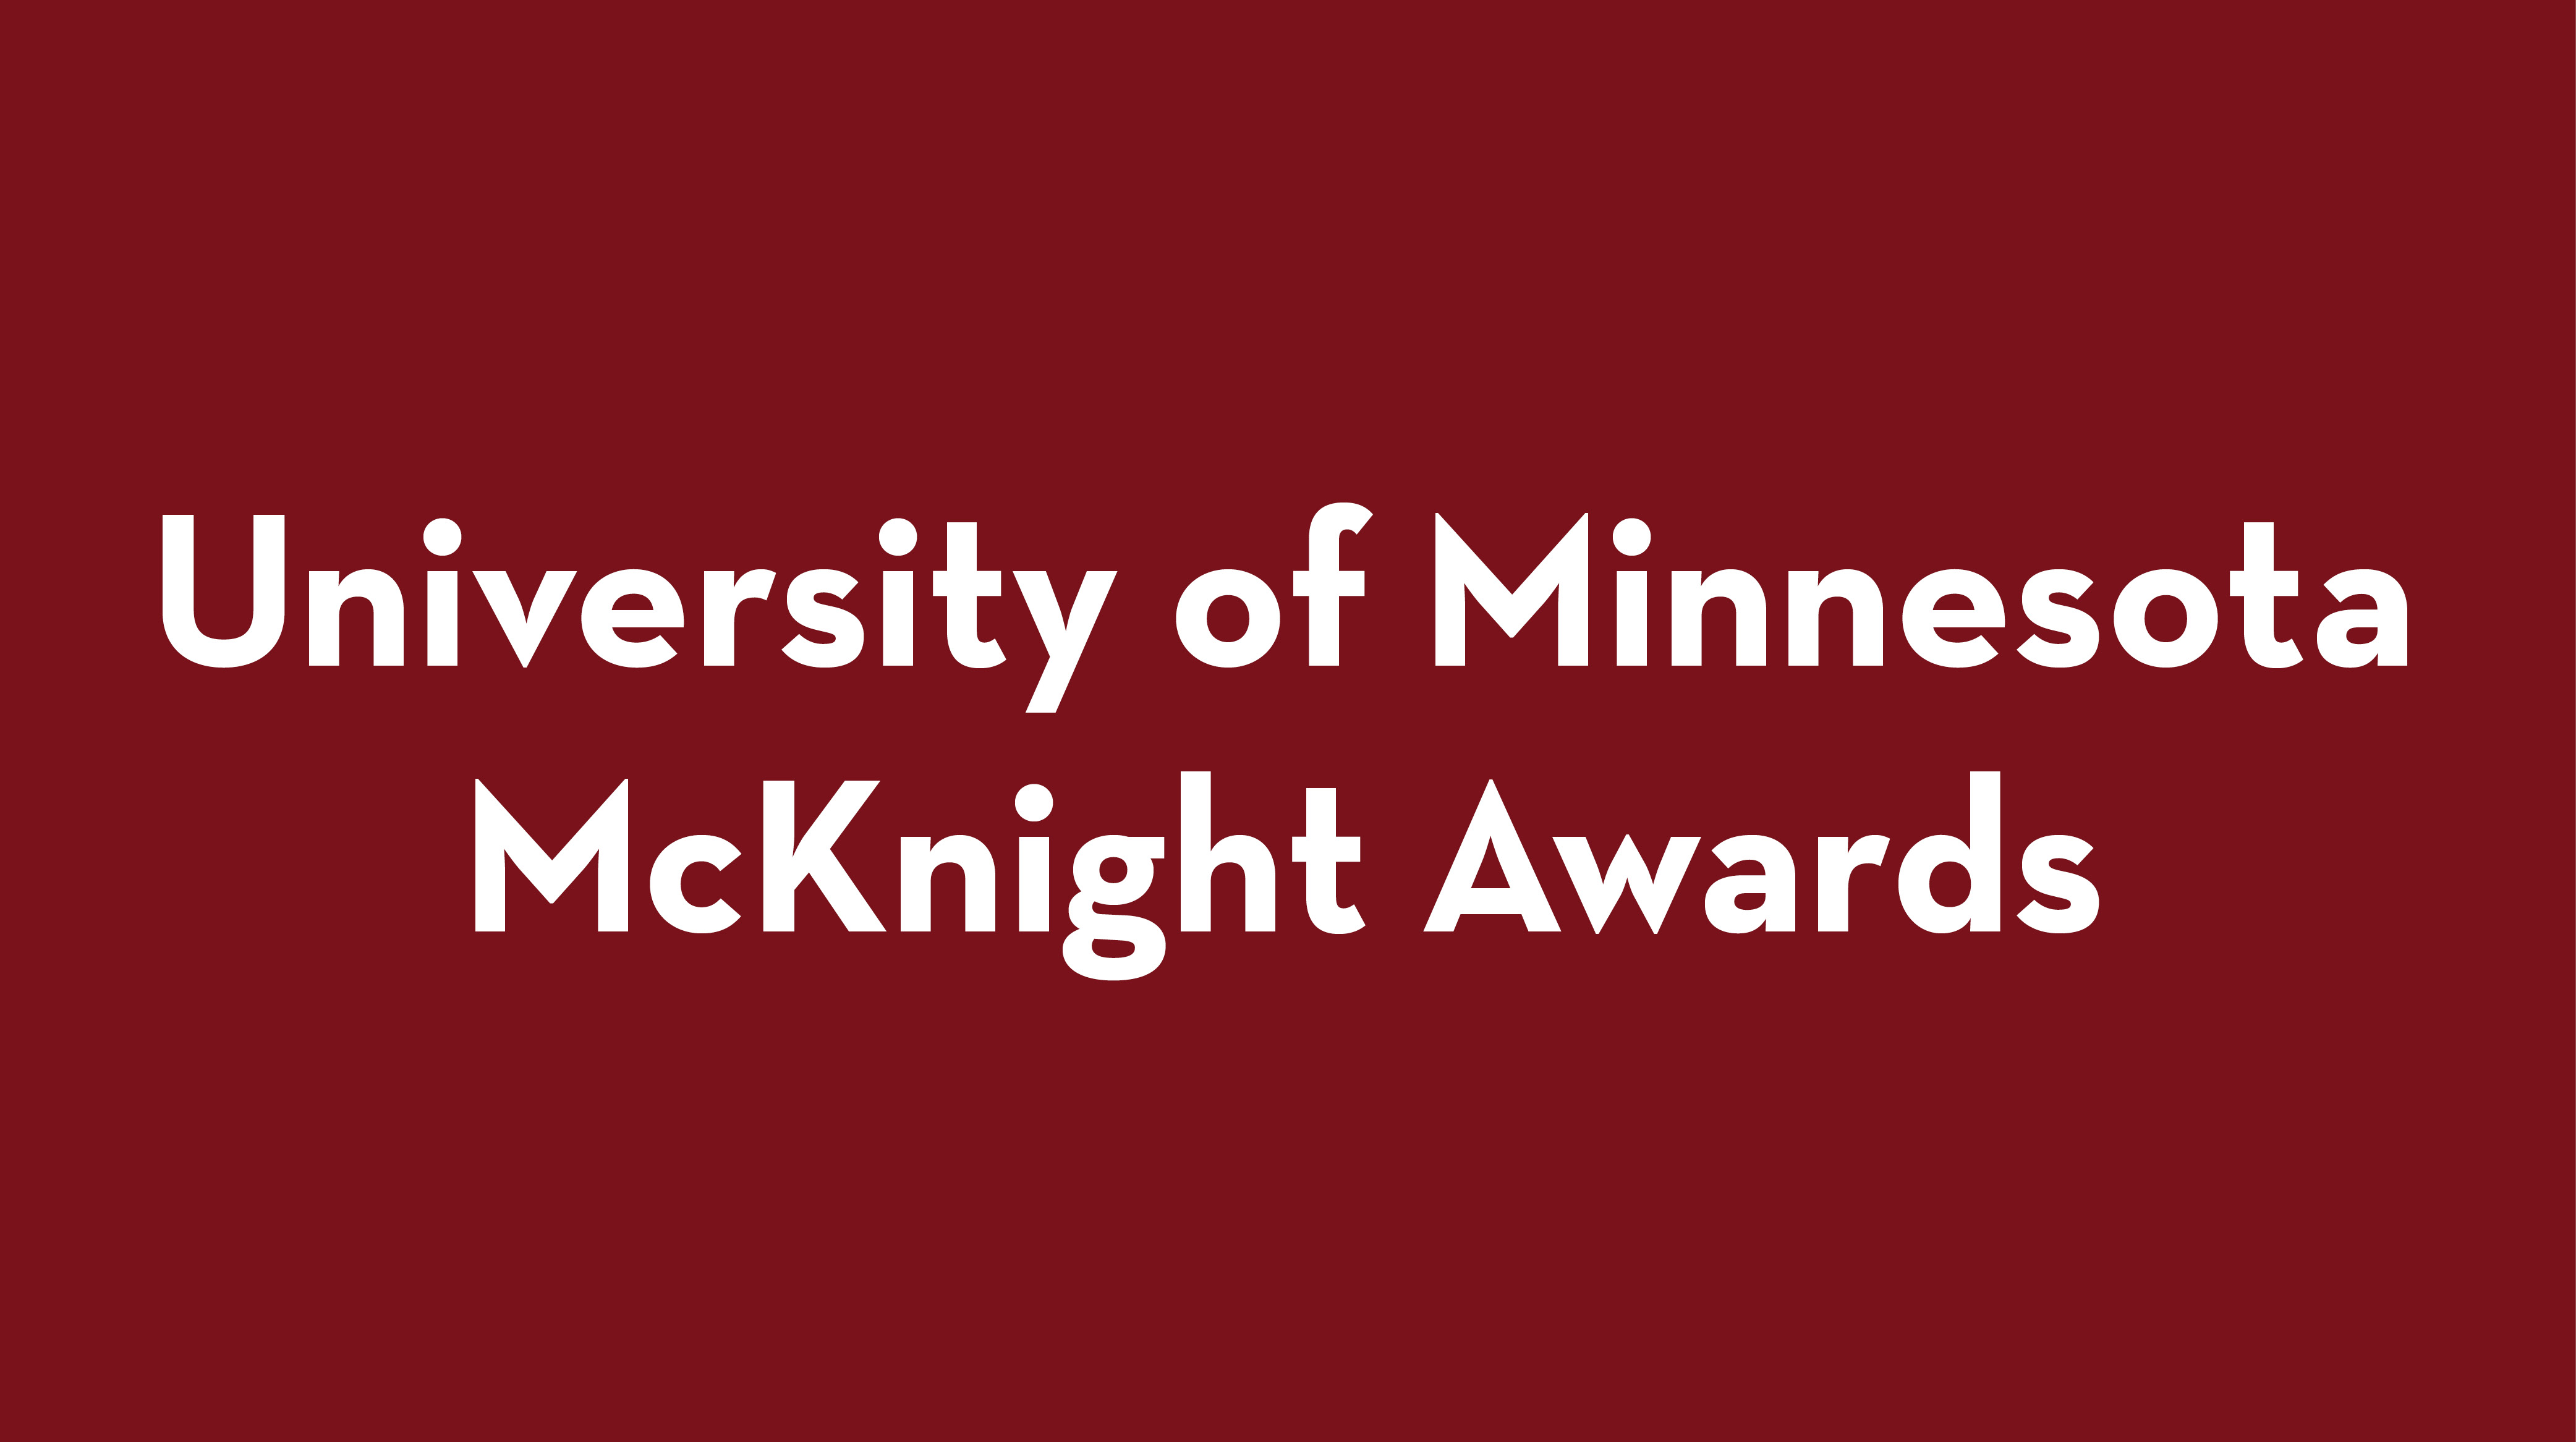 University of Minnesota McKnight Awards